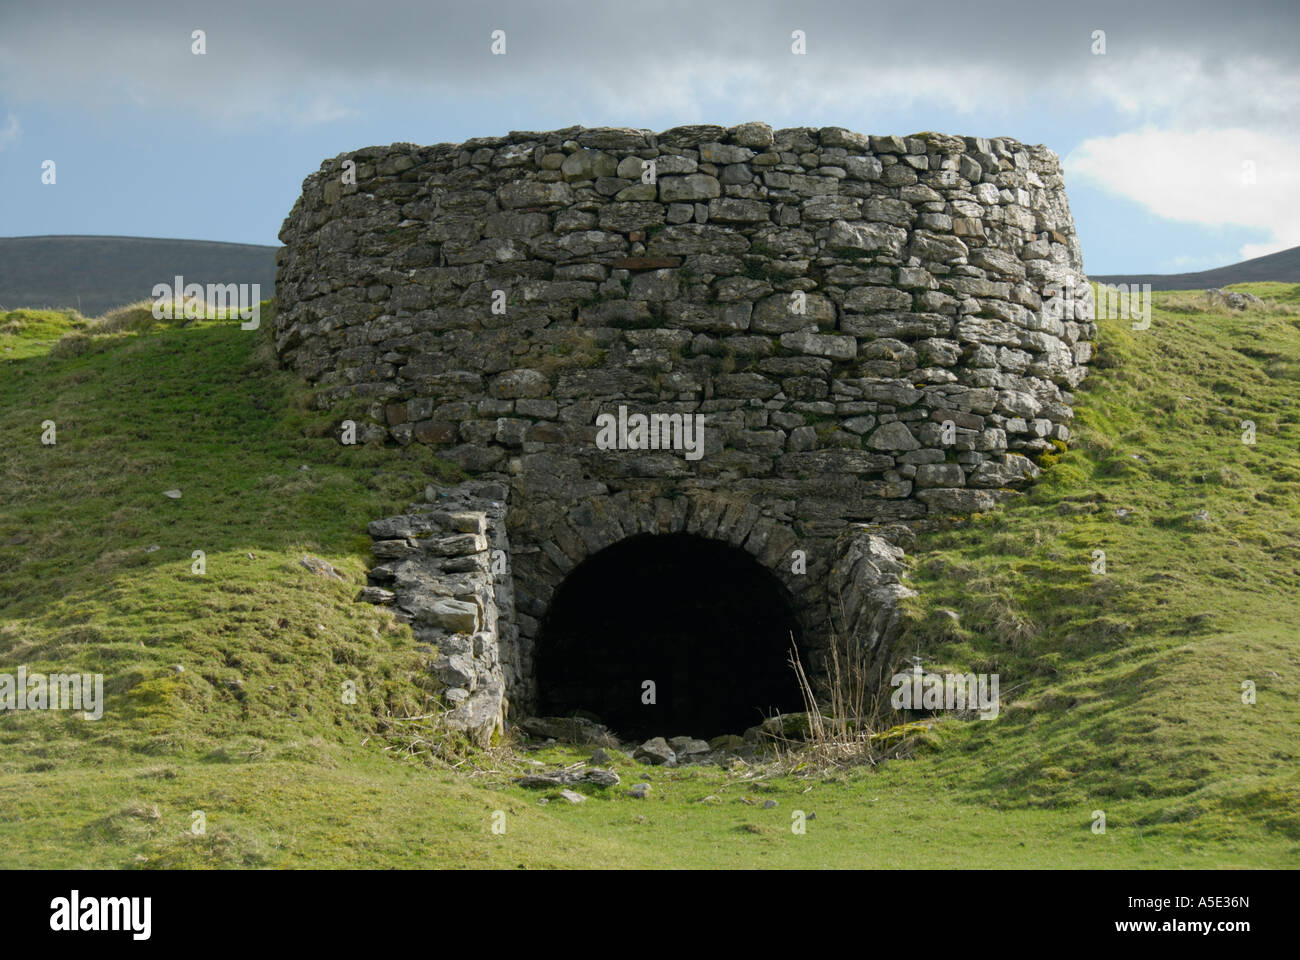 derelict-lime-kiln-chapel-le-dale-near-ingleton-yorkshire-dales-national-A5E36N.jpg